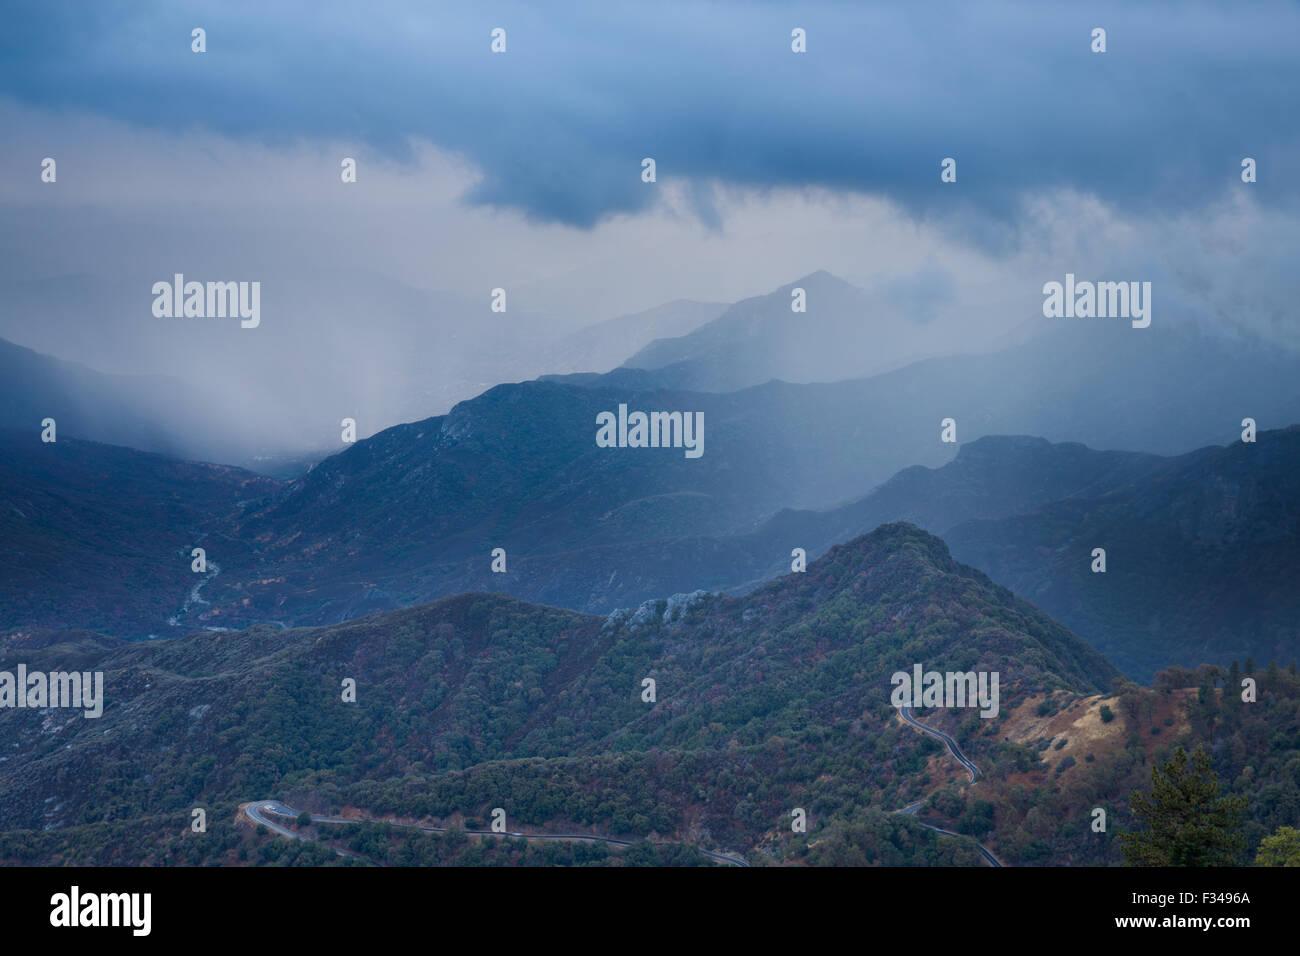 La Kaweah Valley, Sequoia National Park, California, USA Photo Stock